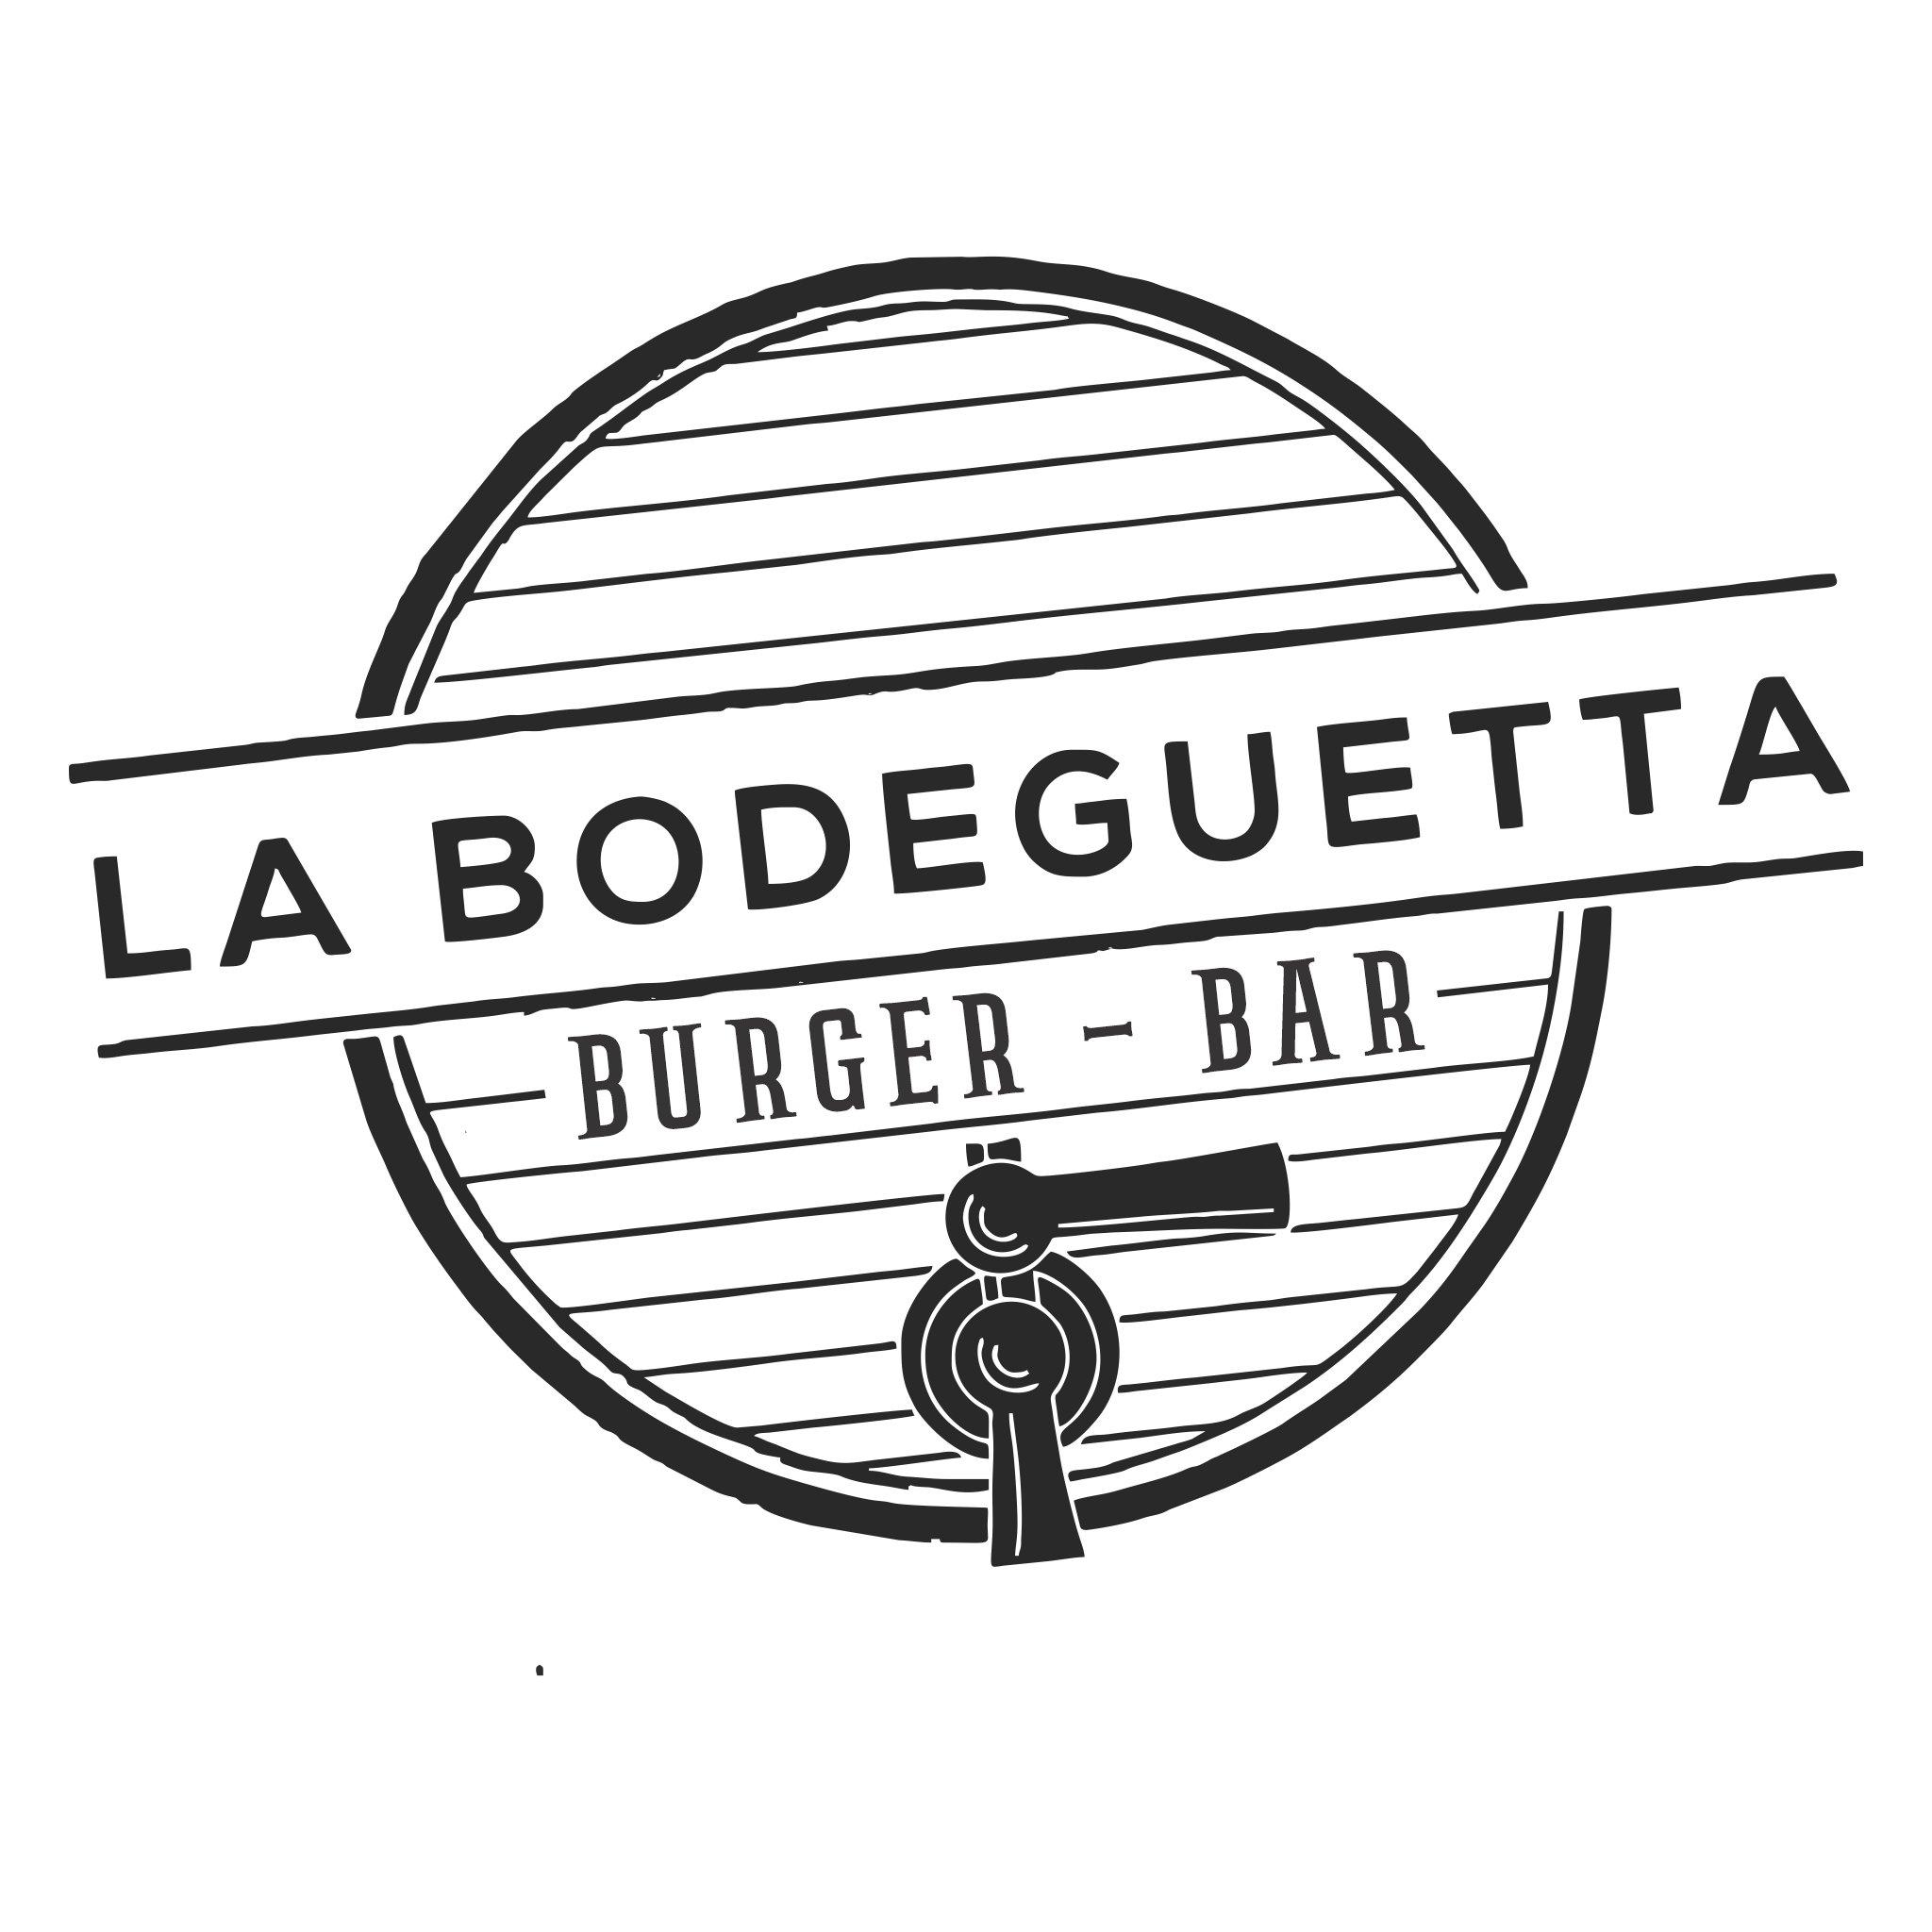 La Bodeguetta Burger Bar